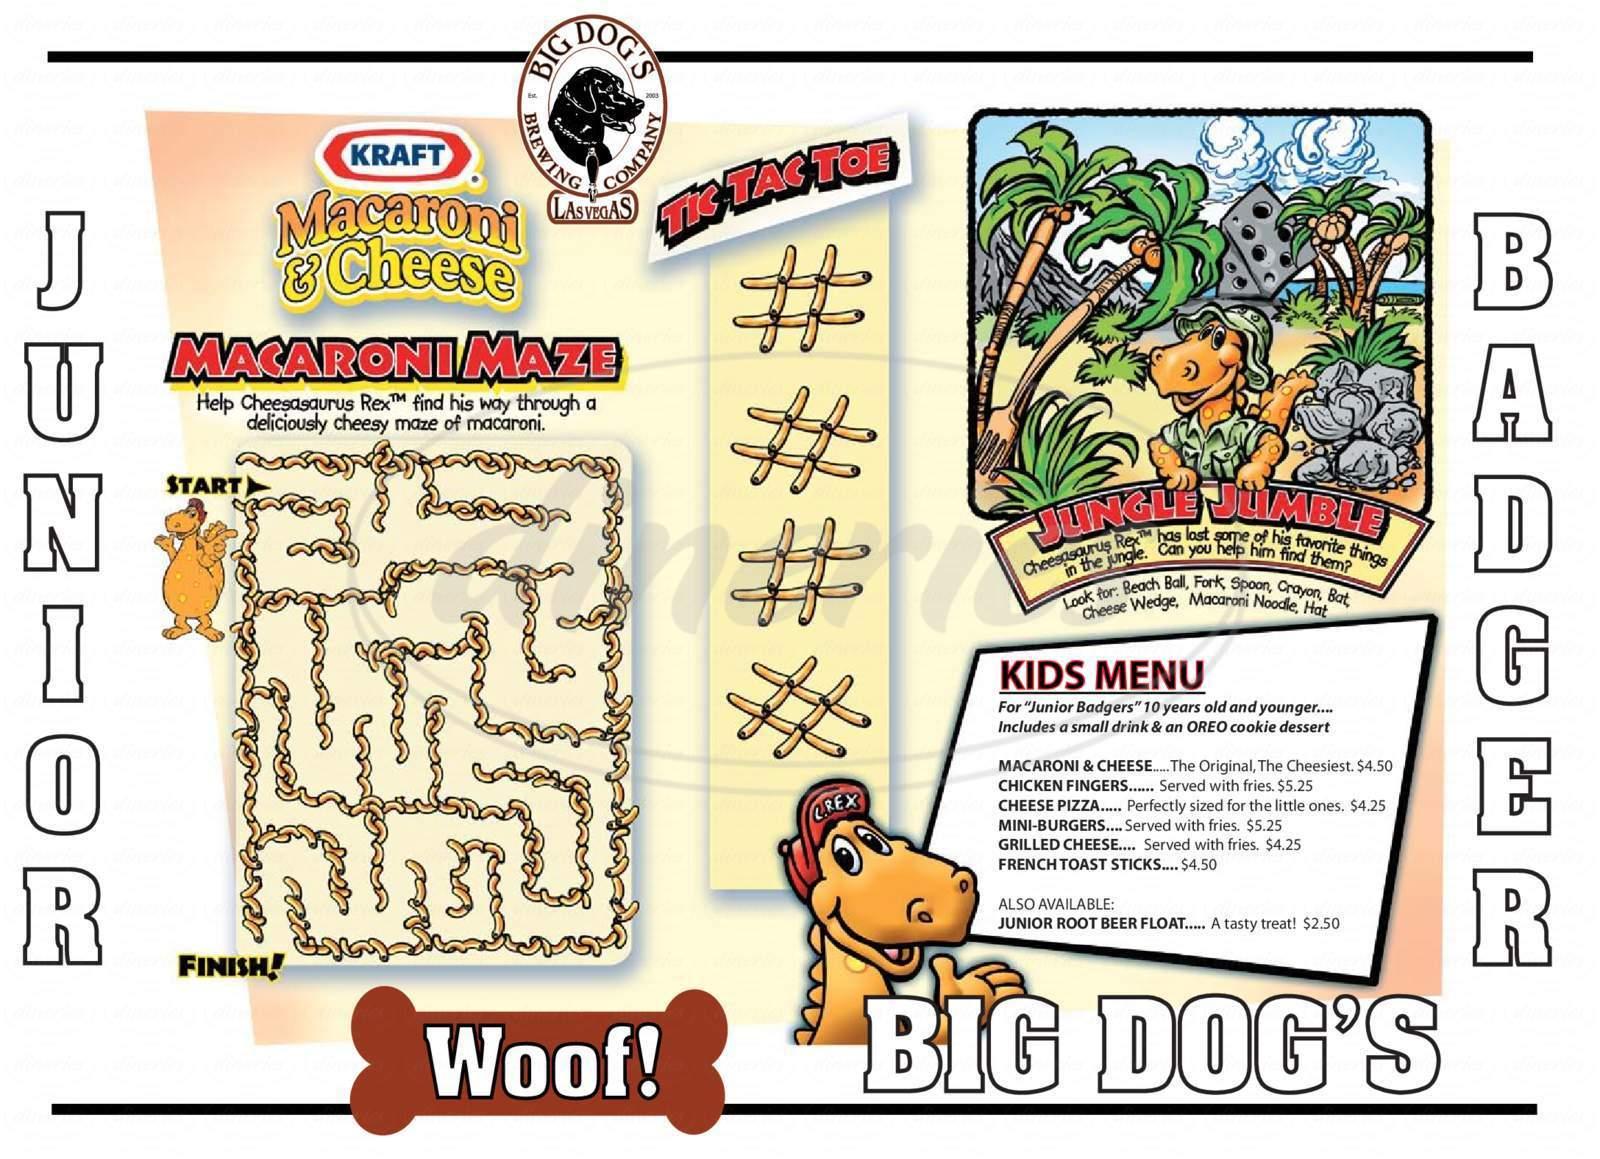 menu for Big Dog's Draft House